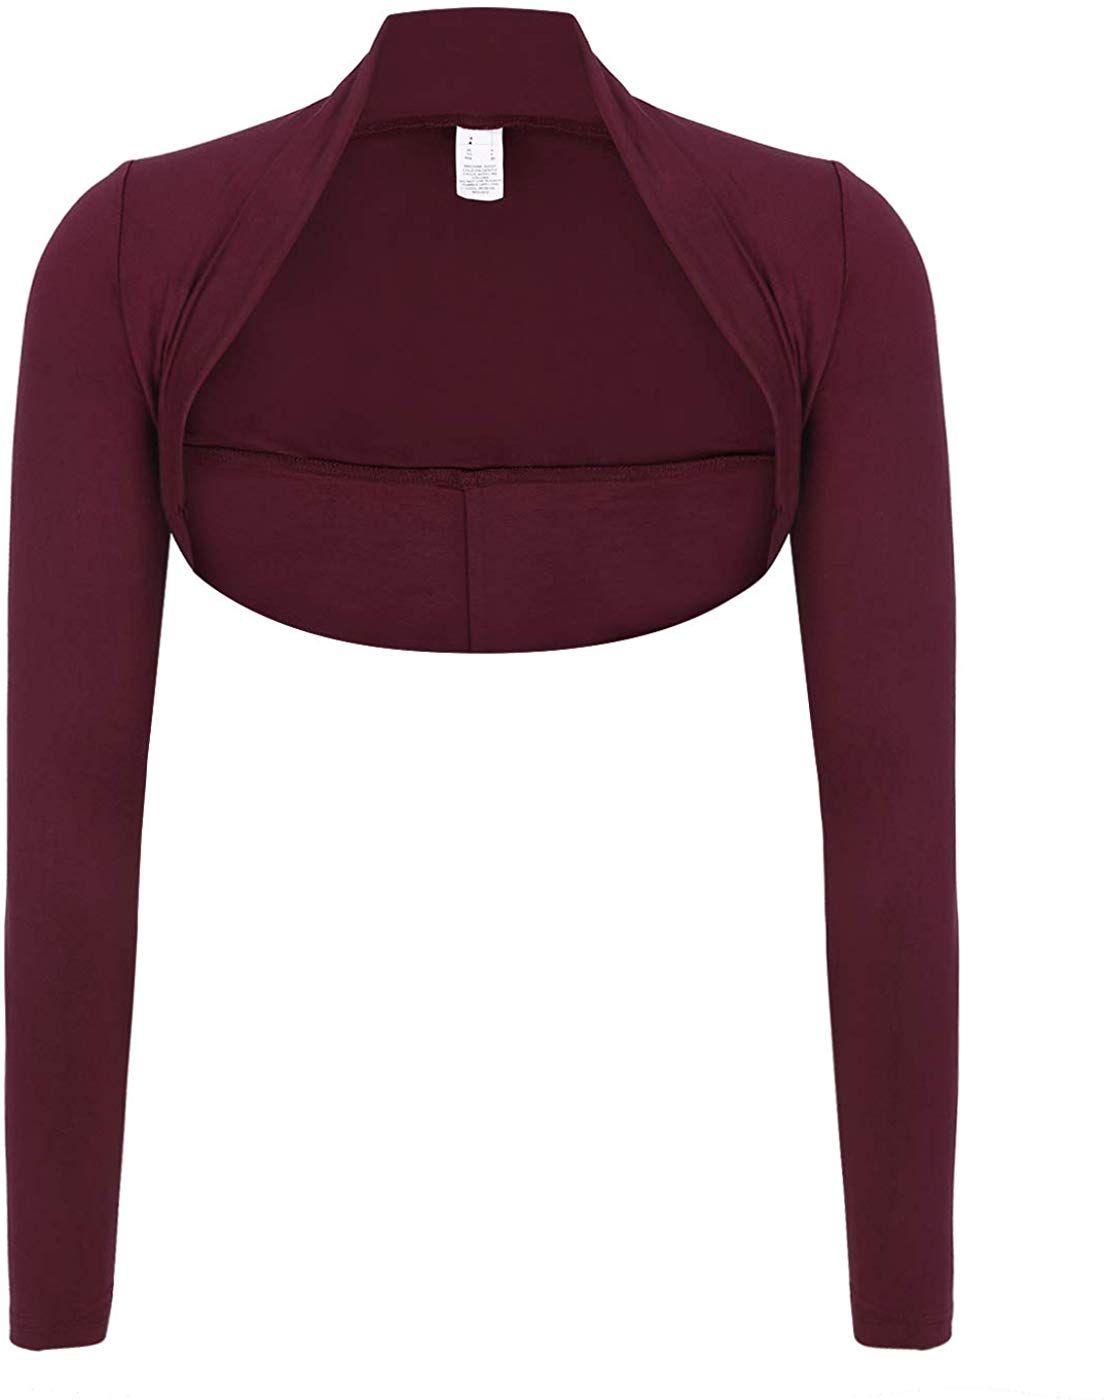 Womens Chiffon Long Sleeve Bolero Shrug Jacket Crop Top Cardigan Coat Sweater